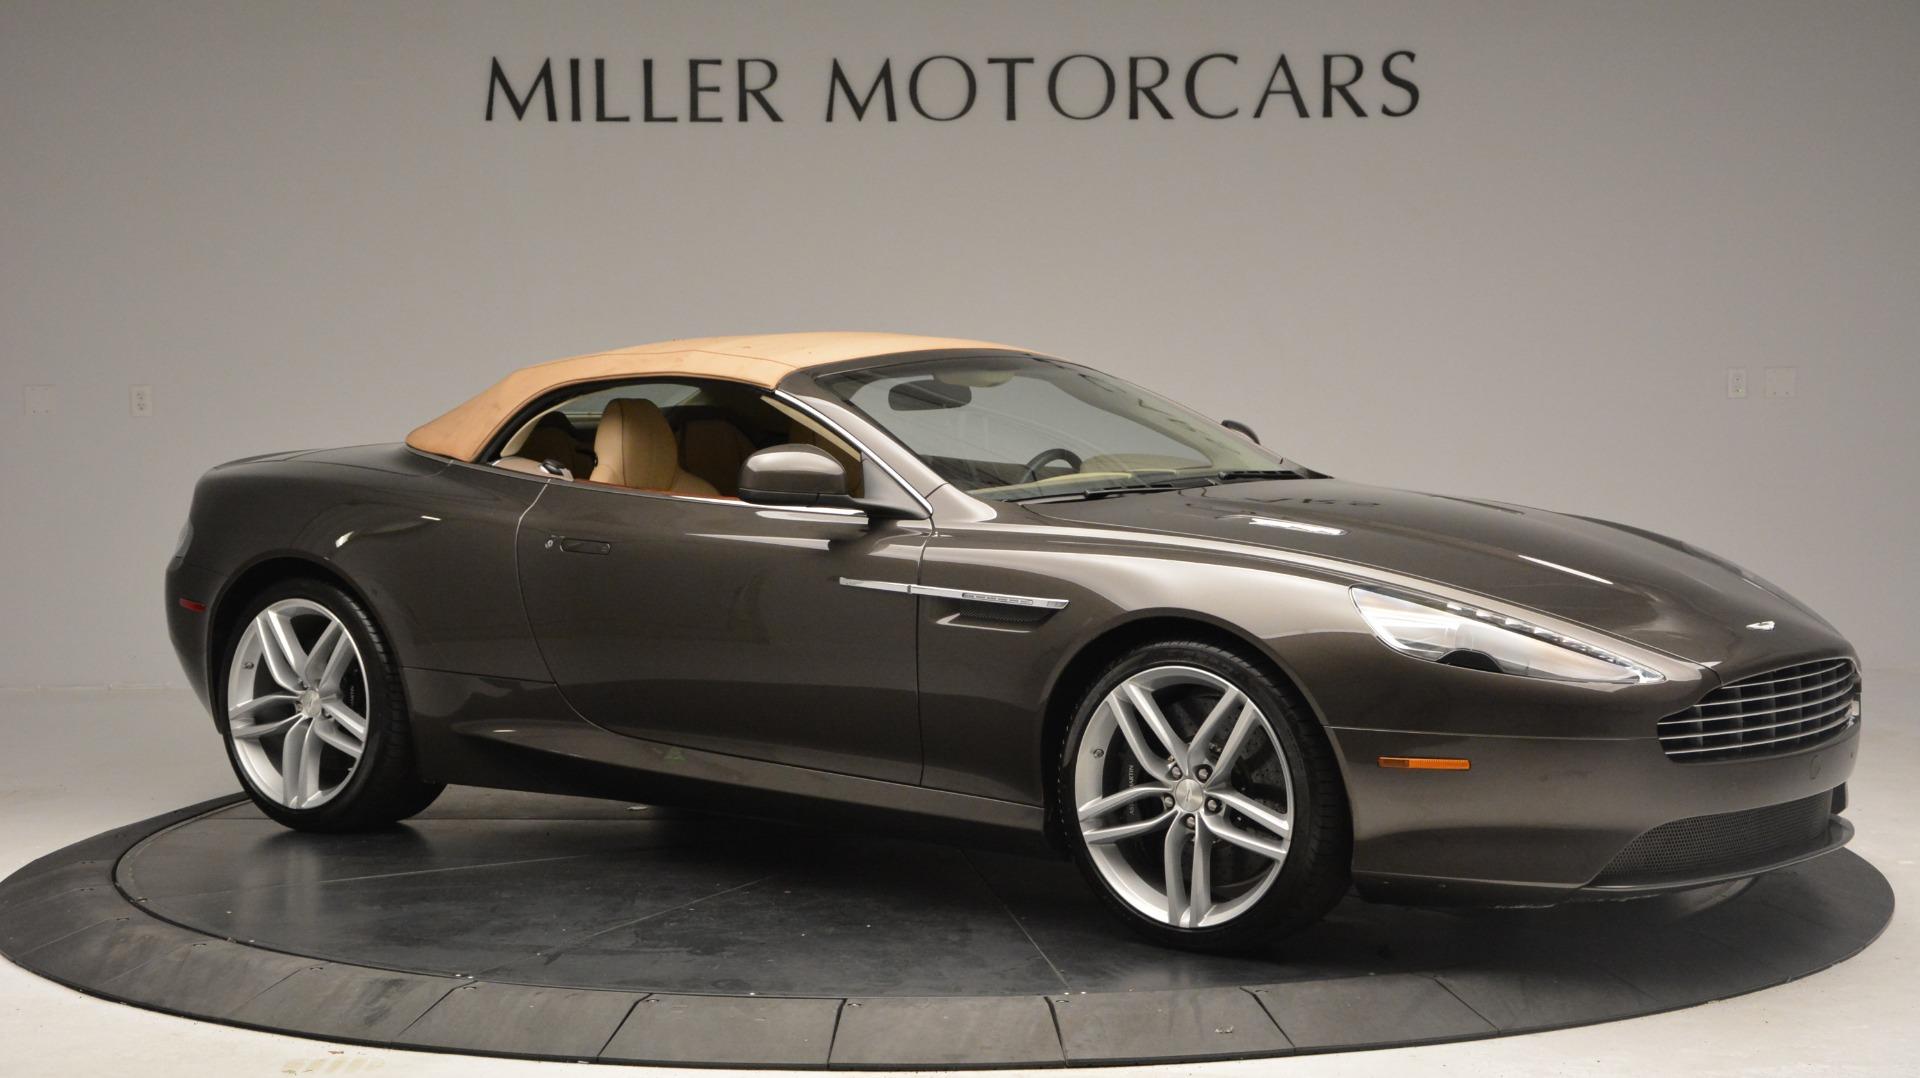 Used 2012 Aston Martin Virage Convertible For Sale In Greenwich, CT. Alfa Romeo of Greenwich, 7613 3351_p19